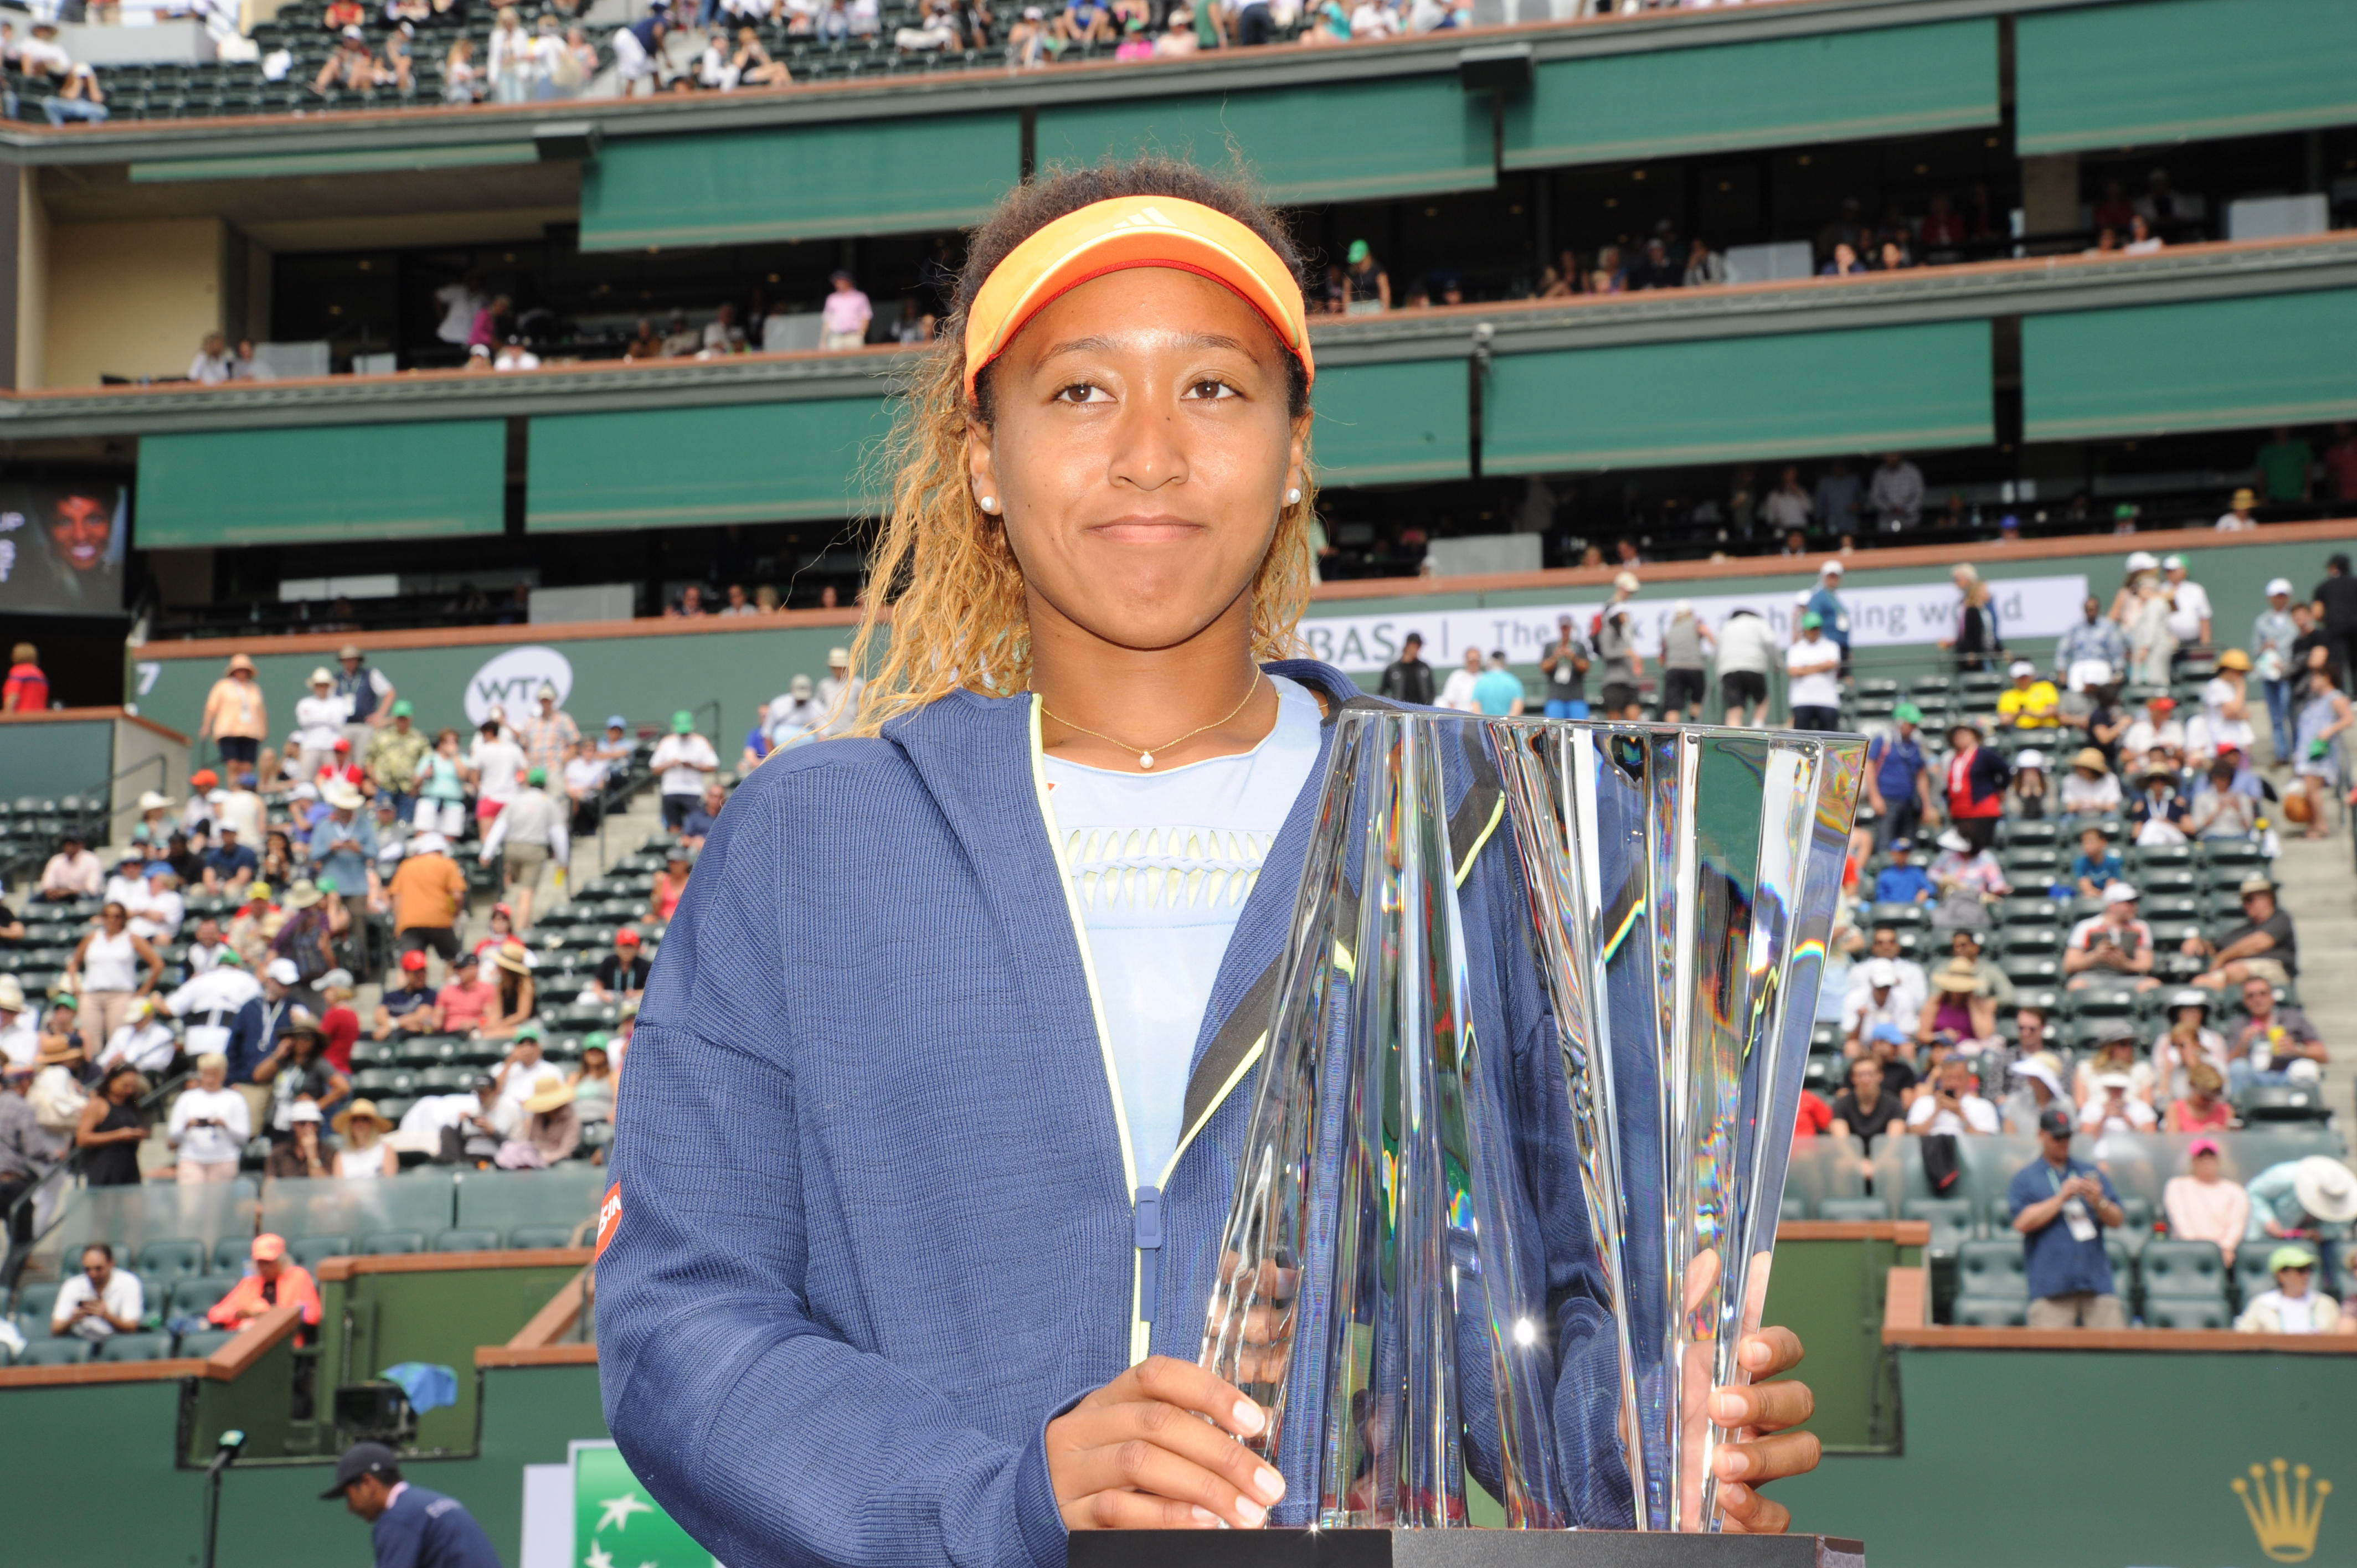 Tennis - ATP - Cinq choses à savoir sur Naomi Osaka, titrée à Indian Wells